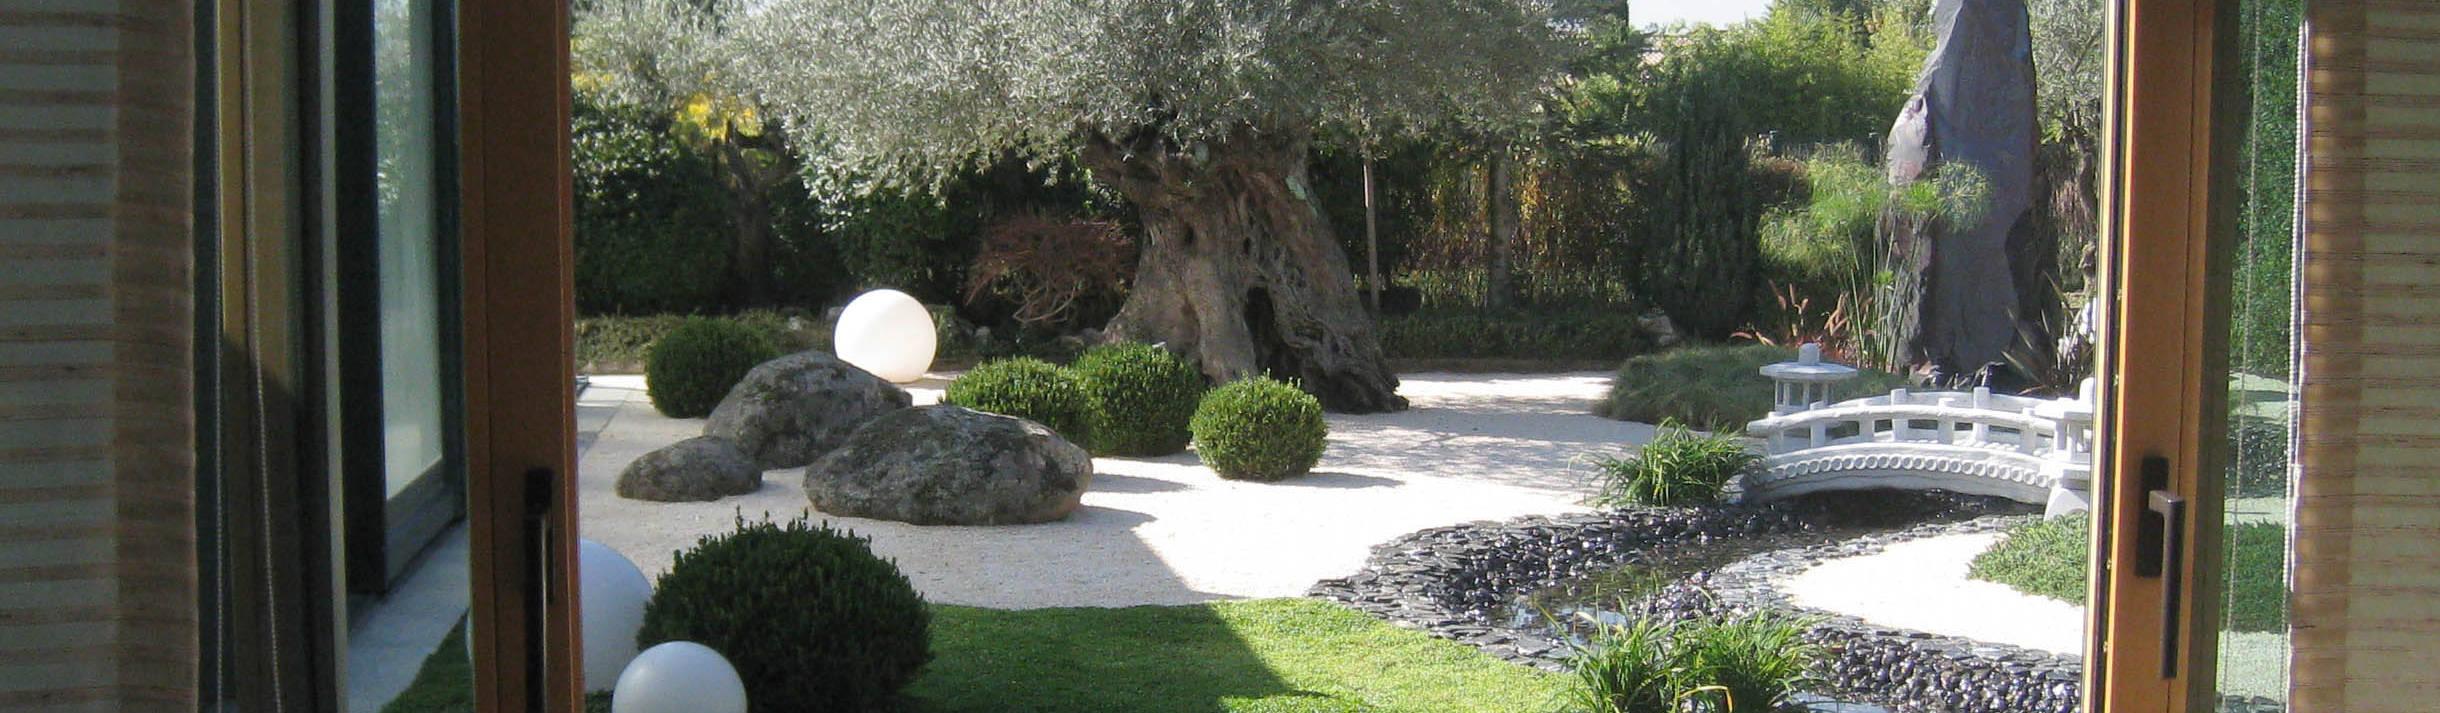 Jard n sostenible de teresa jara estudio de paisajismo - Paisajistas en madrid ...